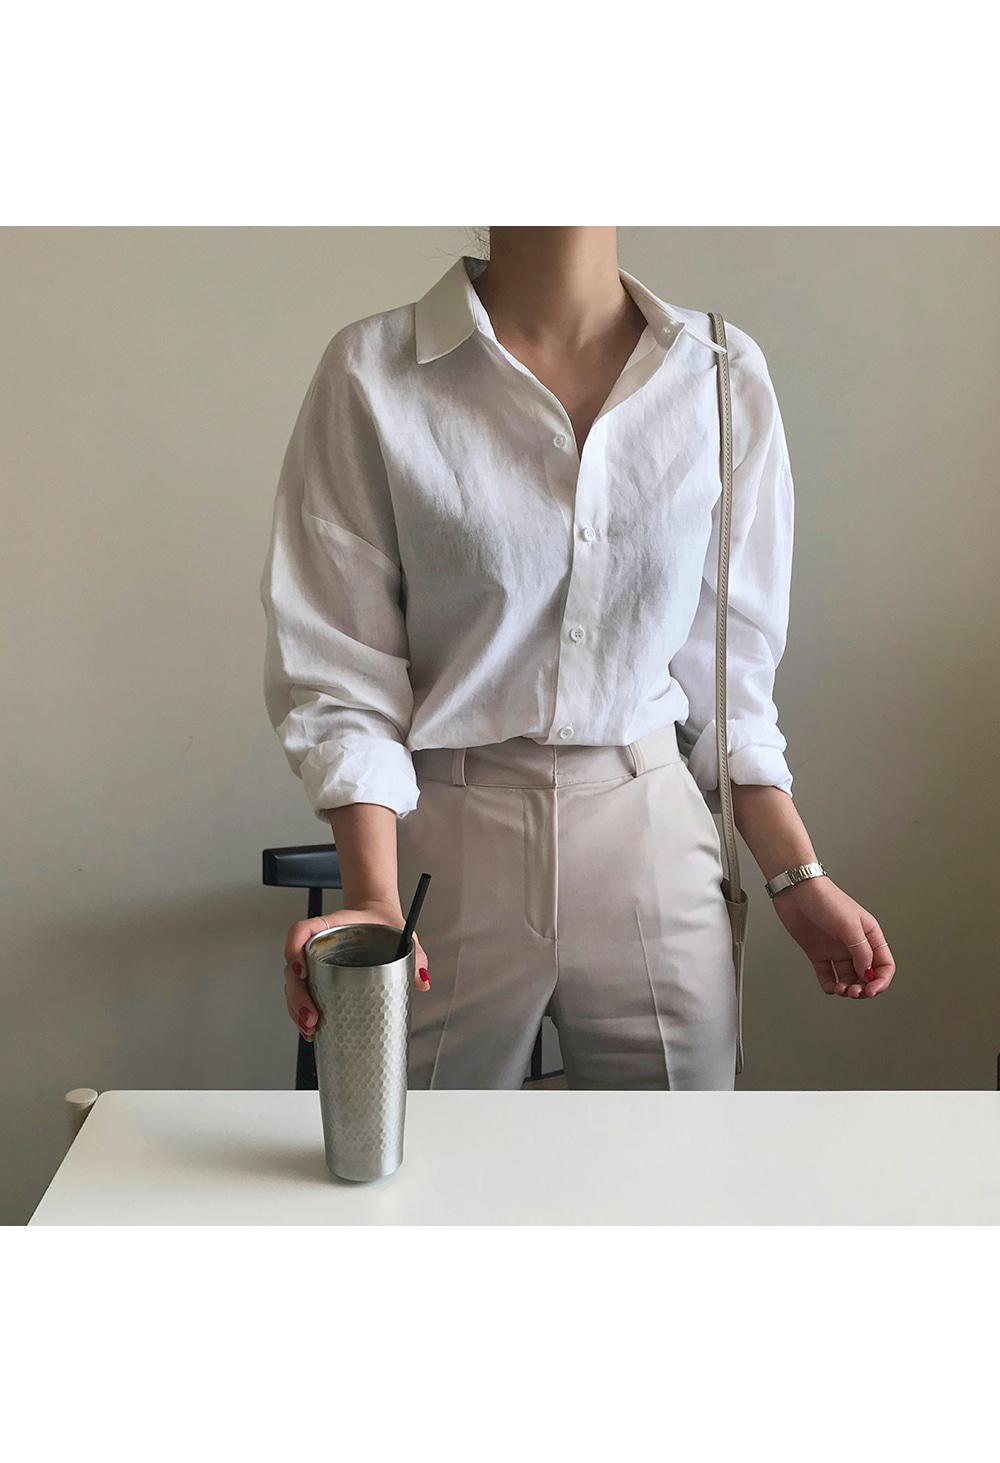 Boxy White Linen Shirt-holiholic.com